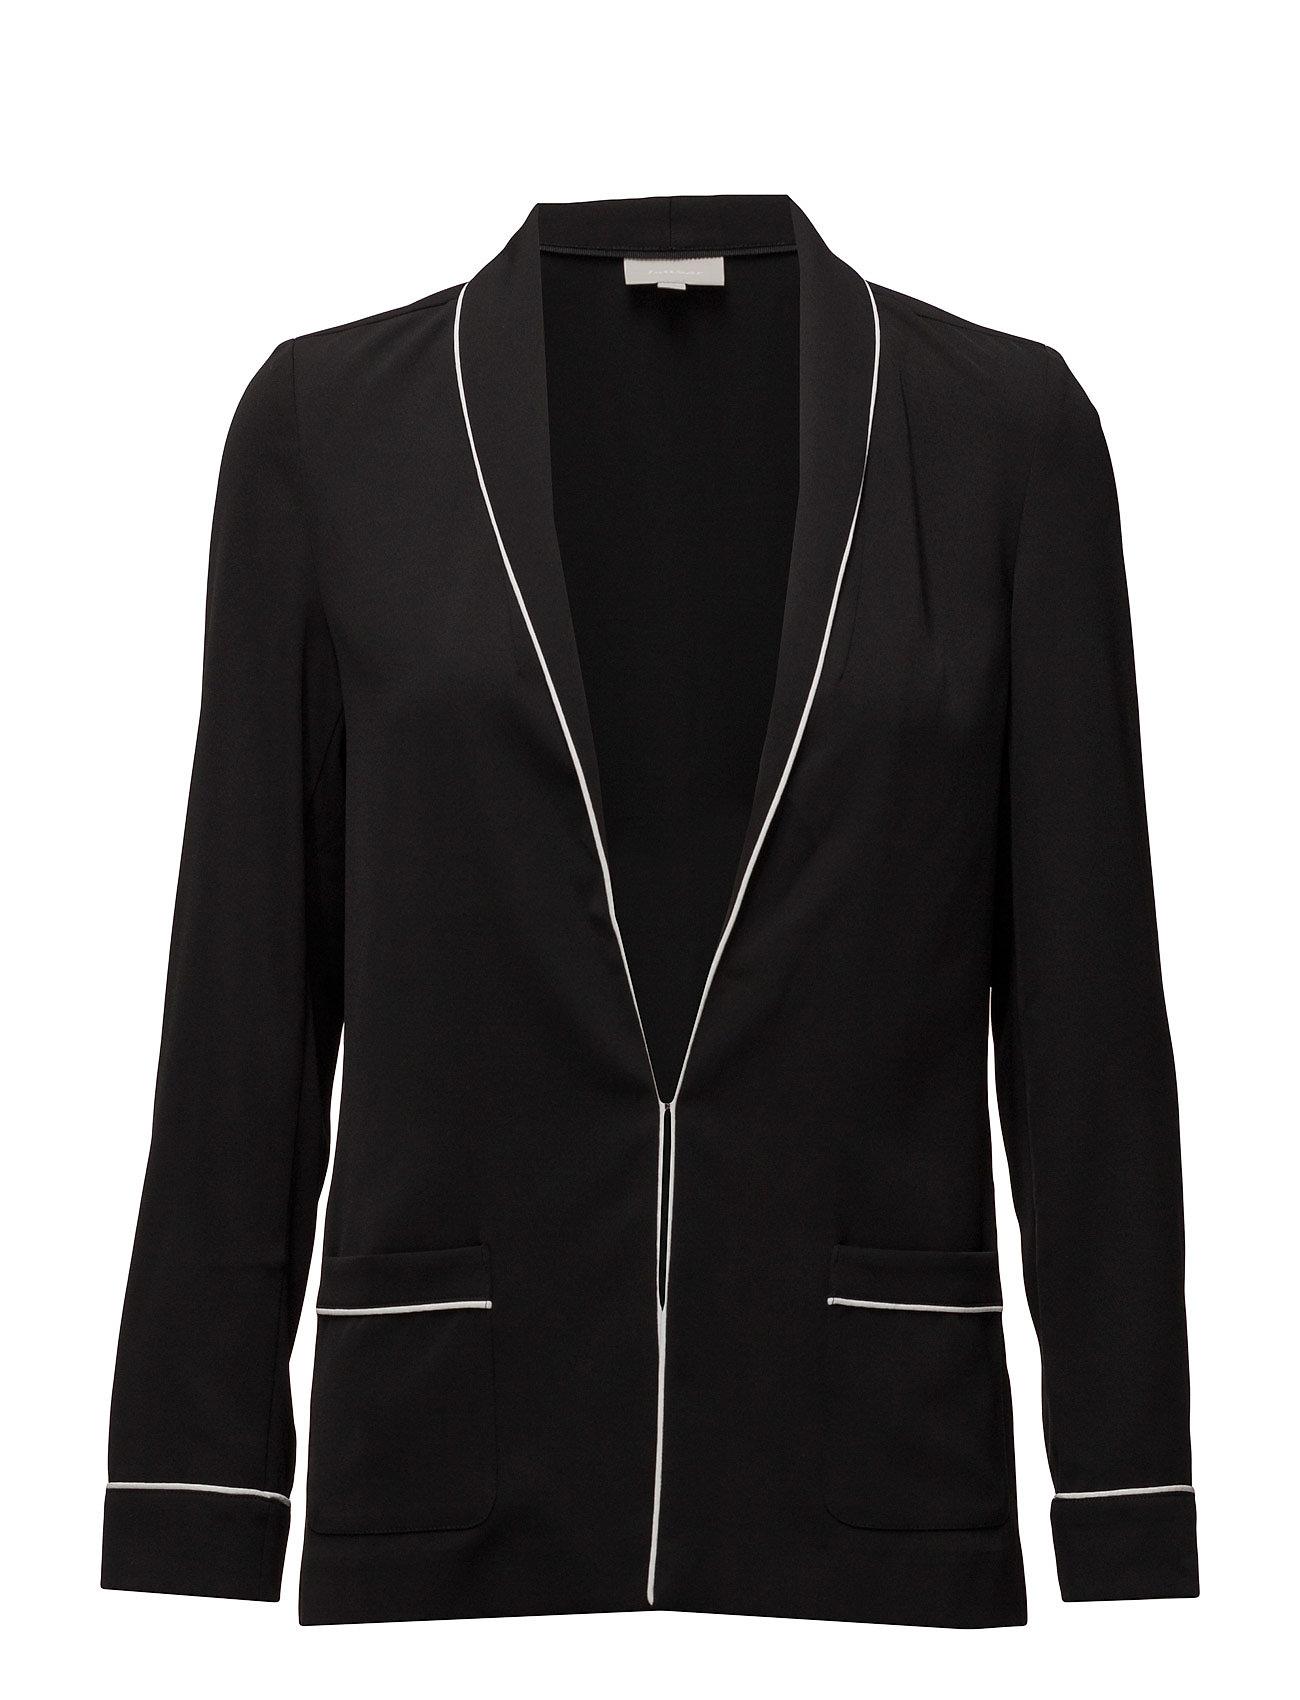 inwear – Mabel blazer lw på boozt.com dk